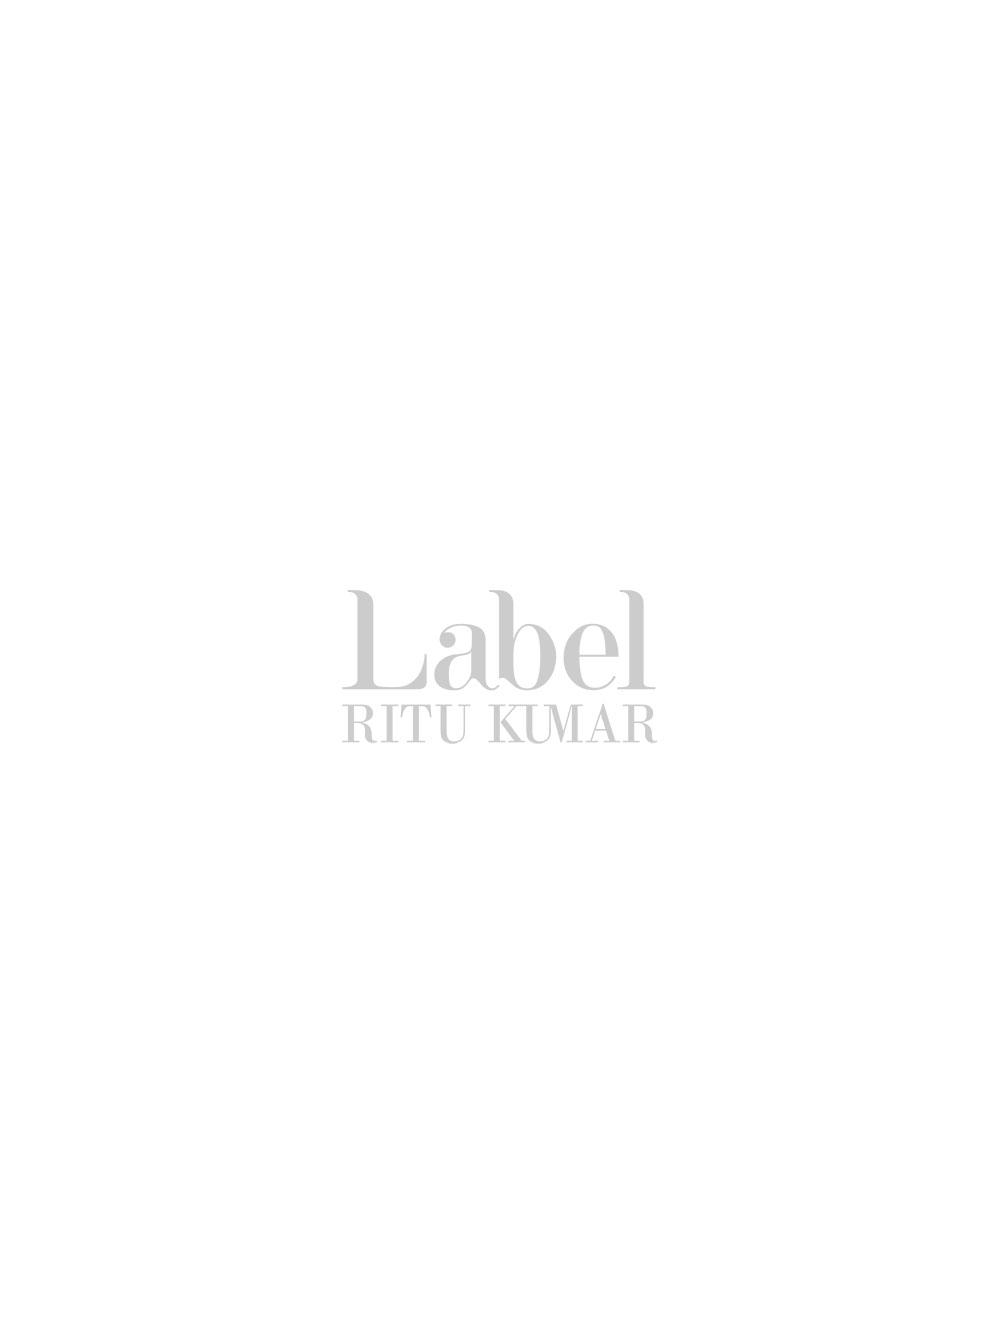 Navy Aztec Print Jacket by label Ritu Kumar